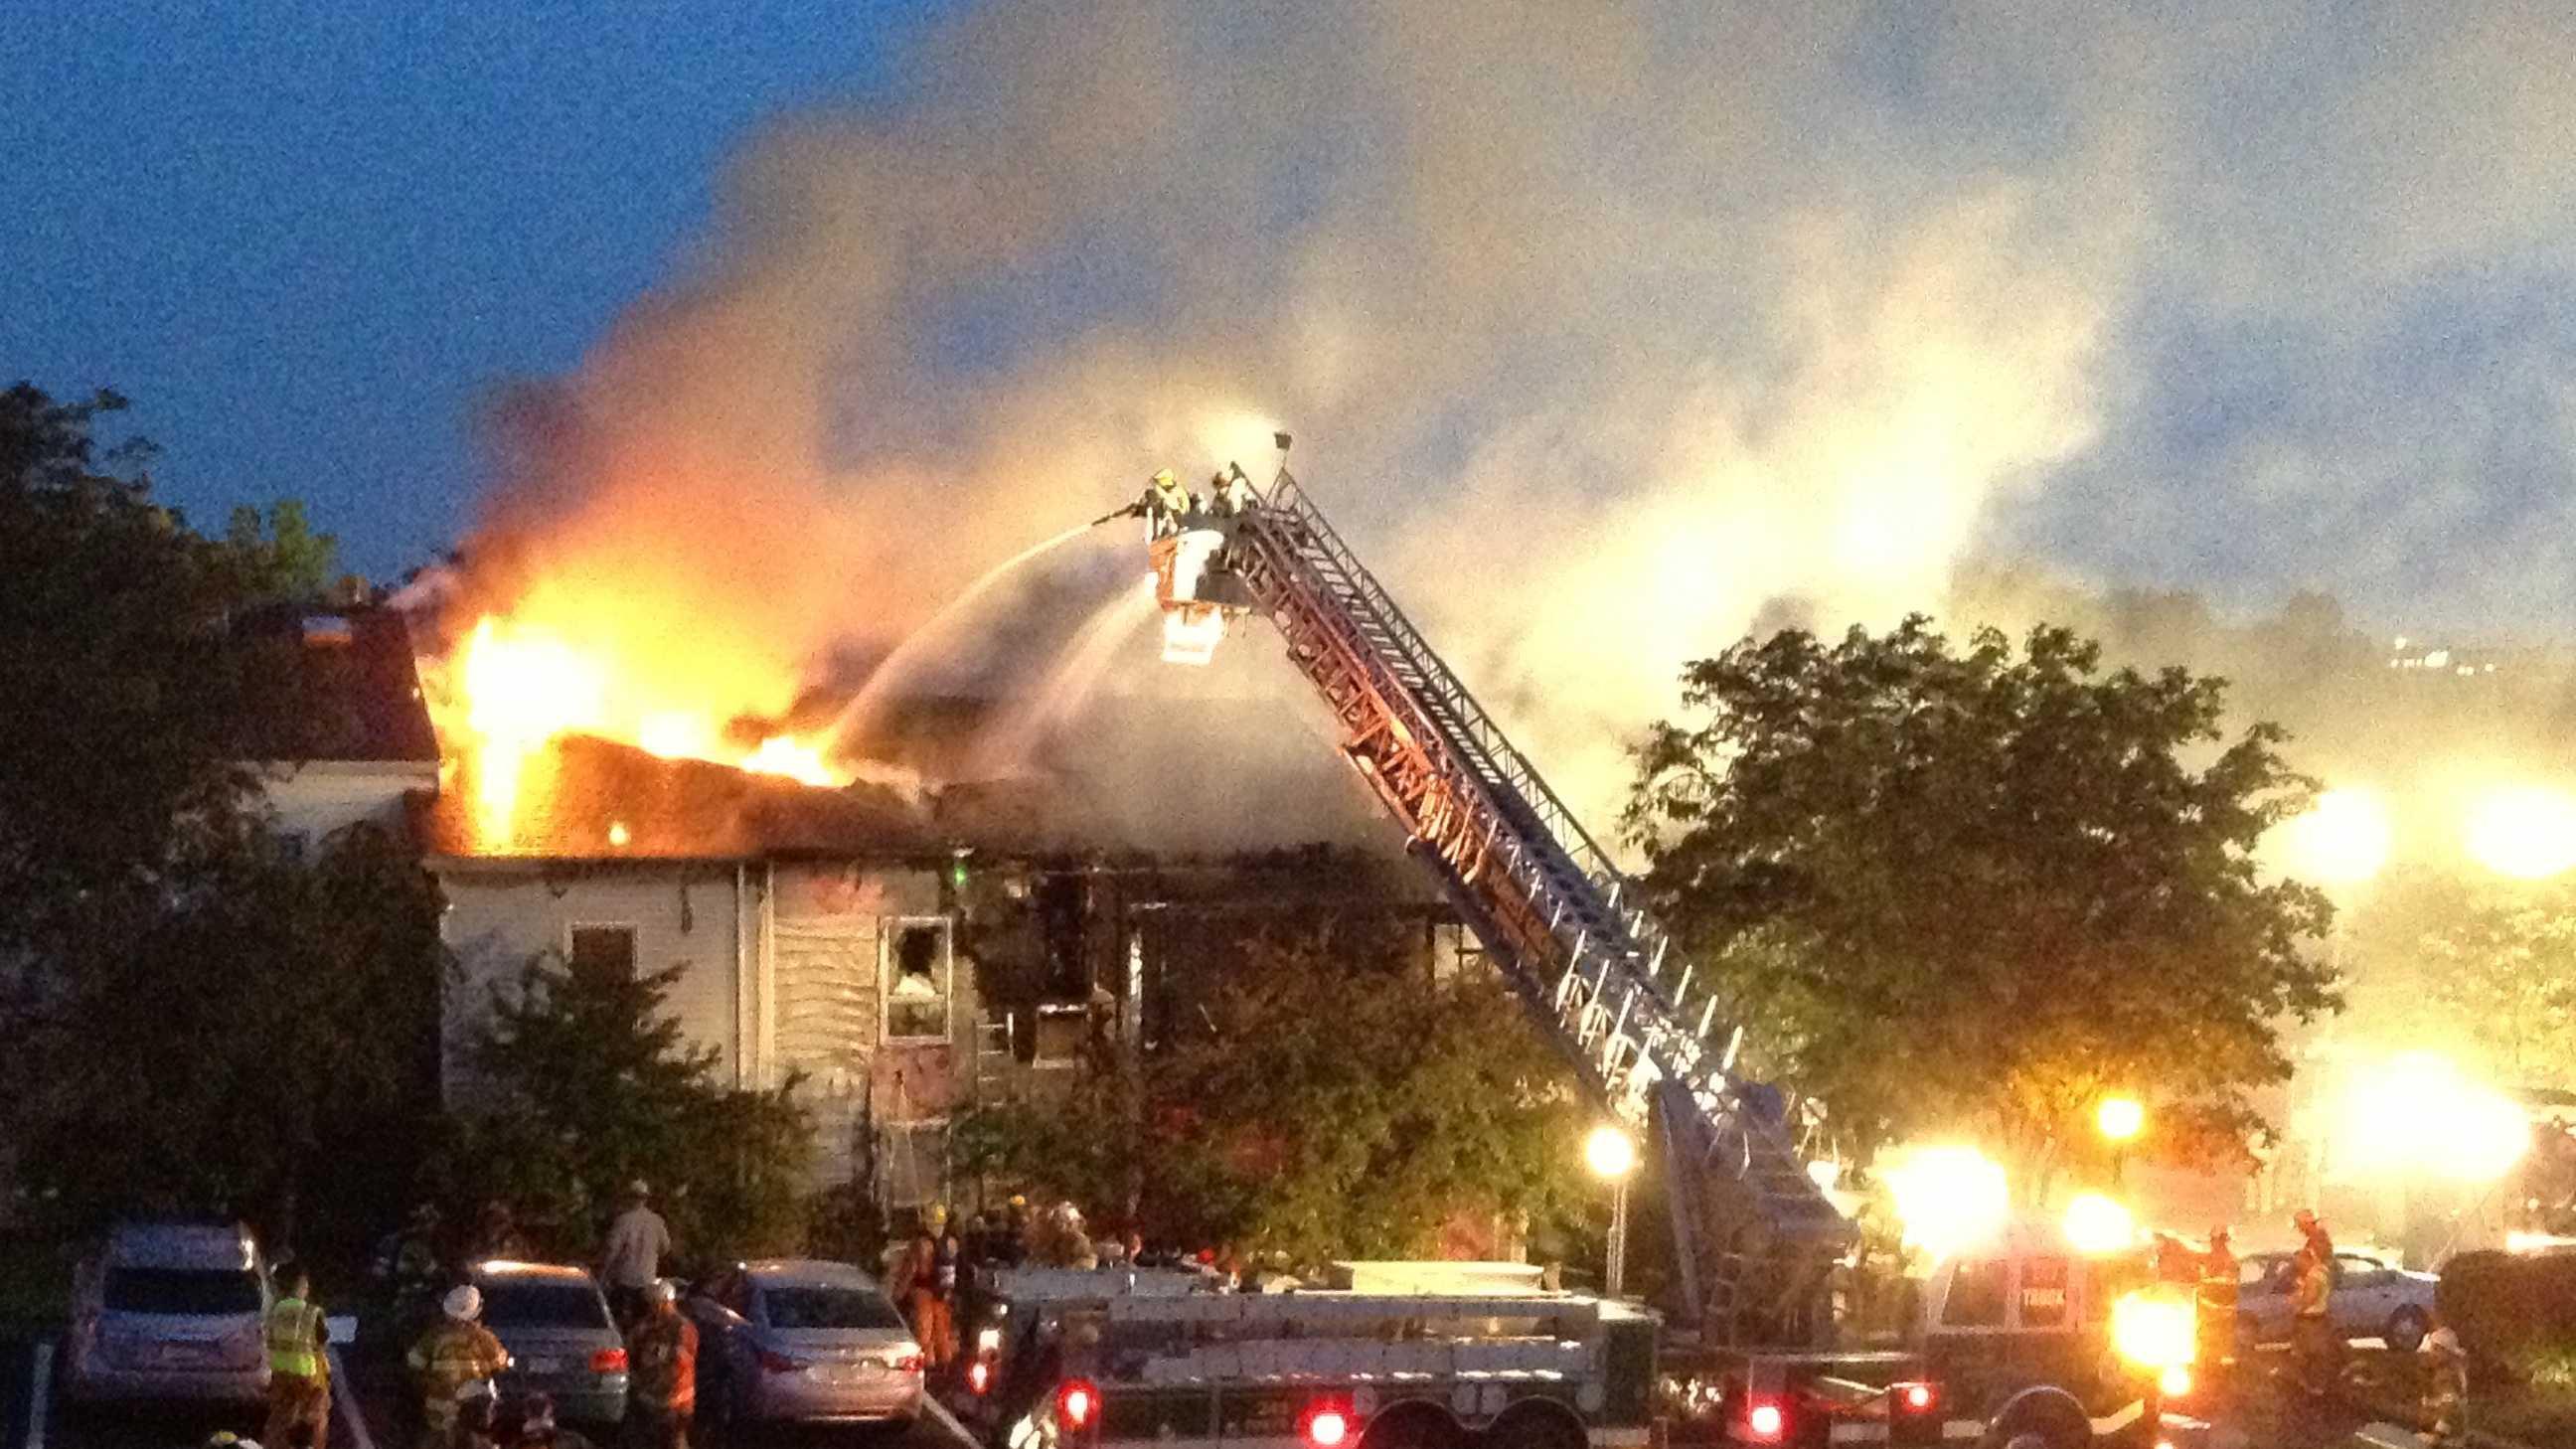 Robinson Township fire